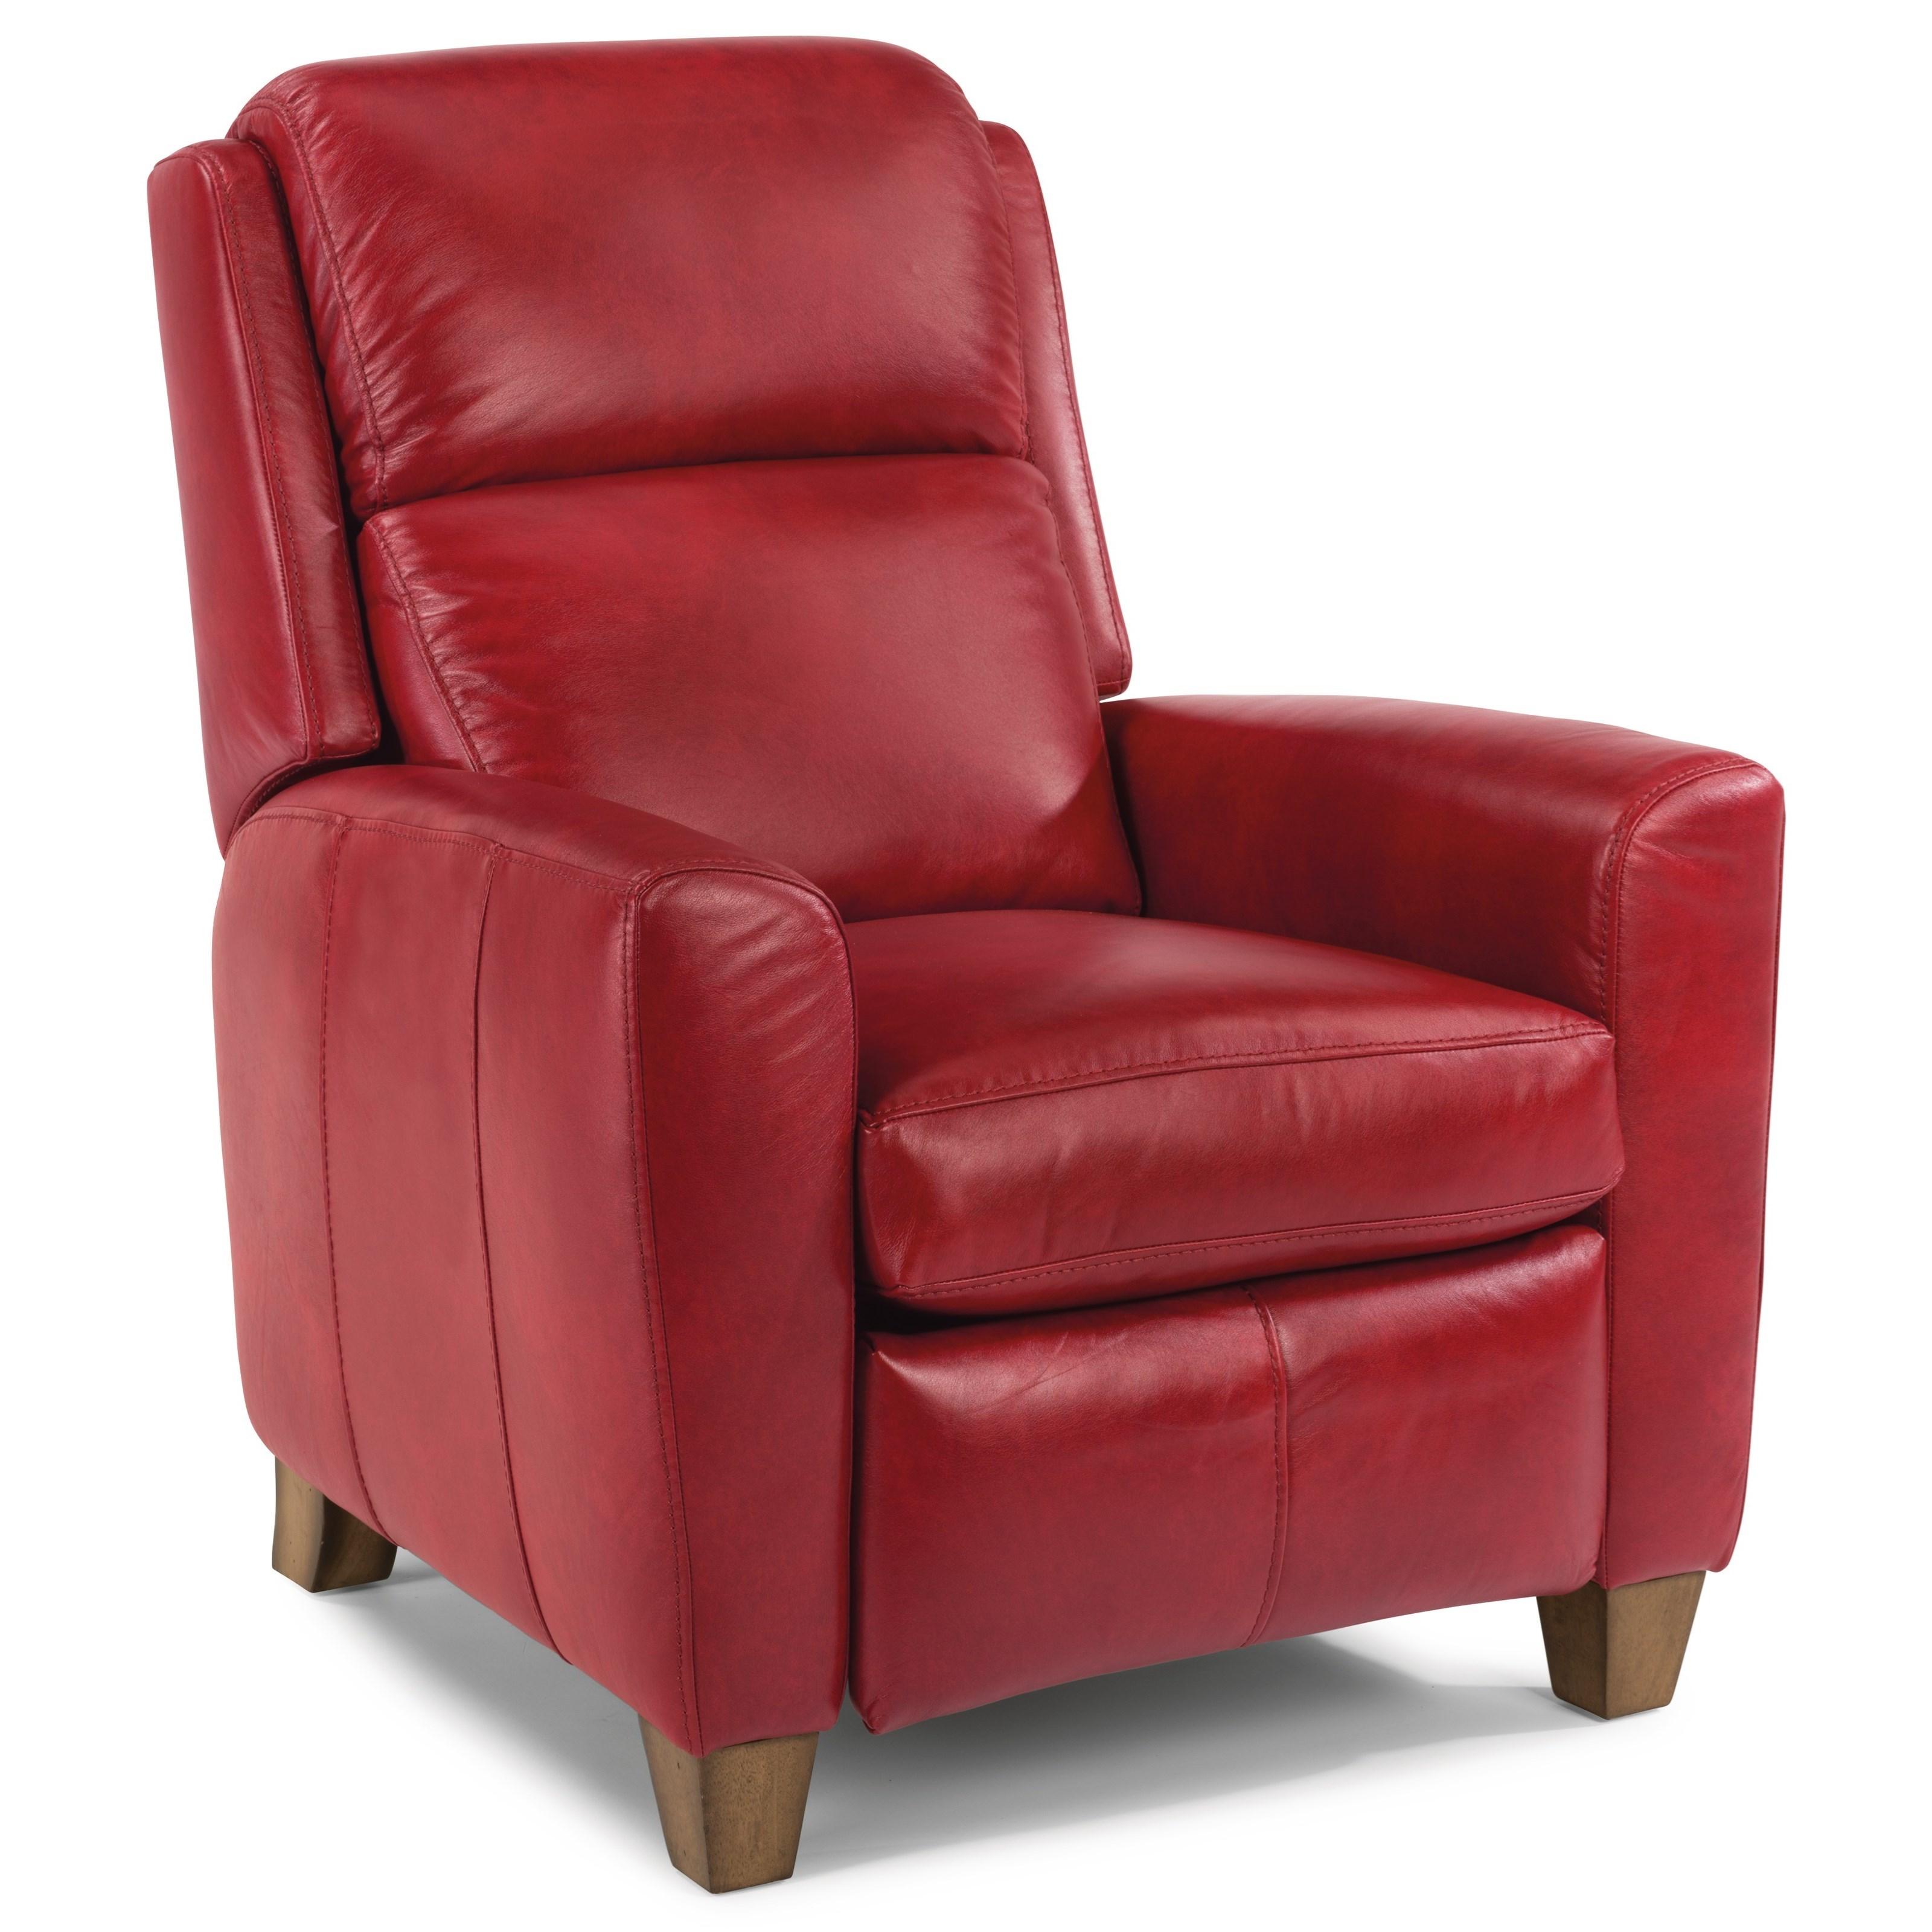 Flexsteel Westside Sofa Reviews: Flexsteel Dion Contemporary Power High-Leg Recliner With